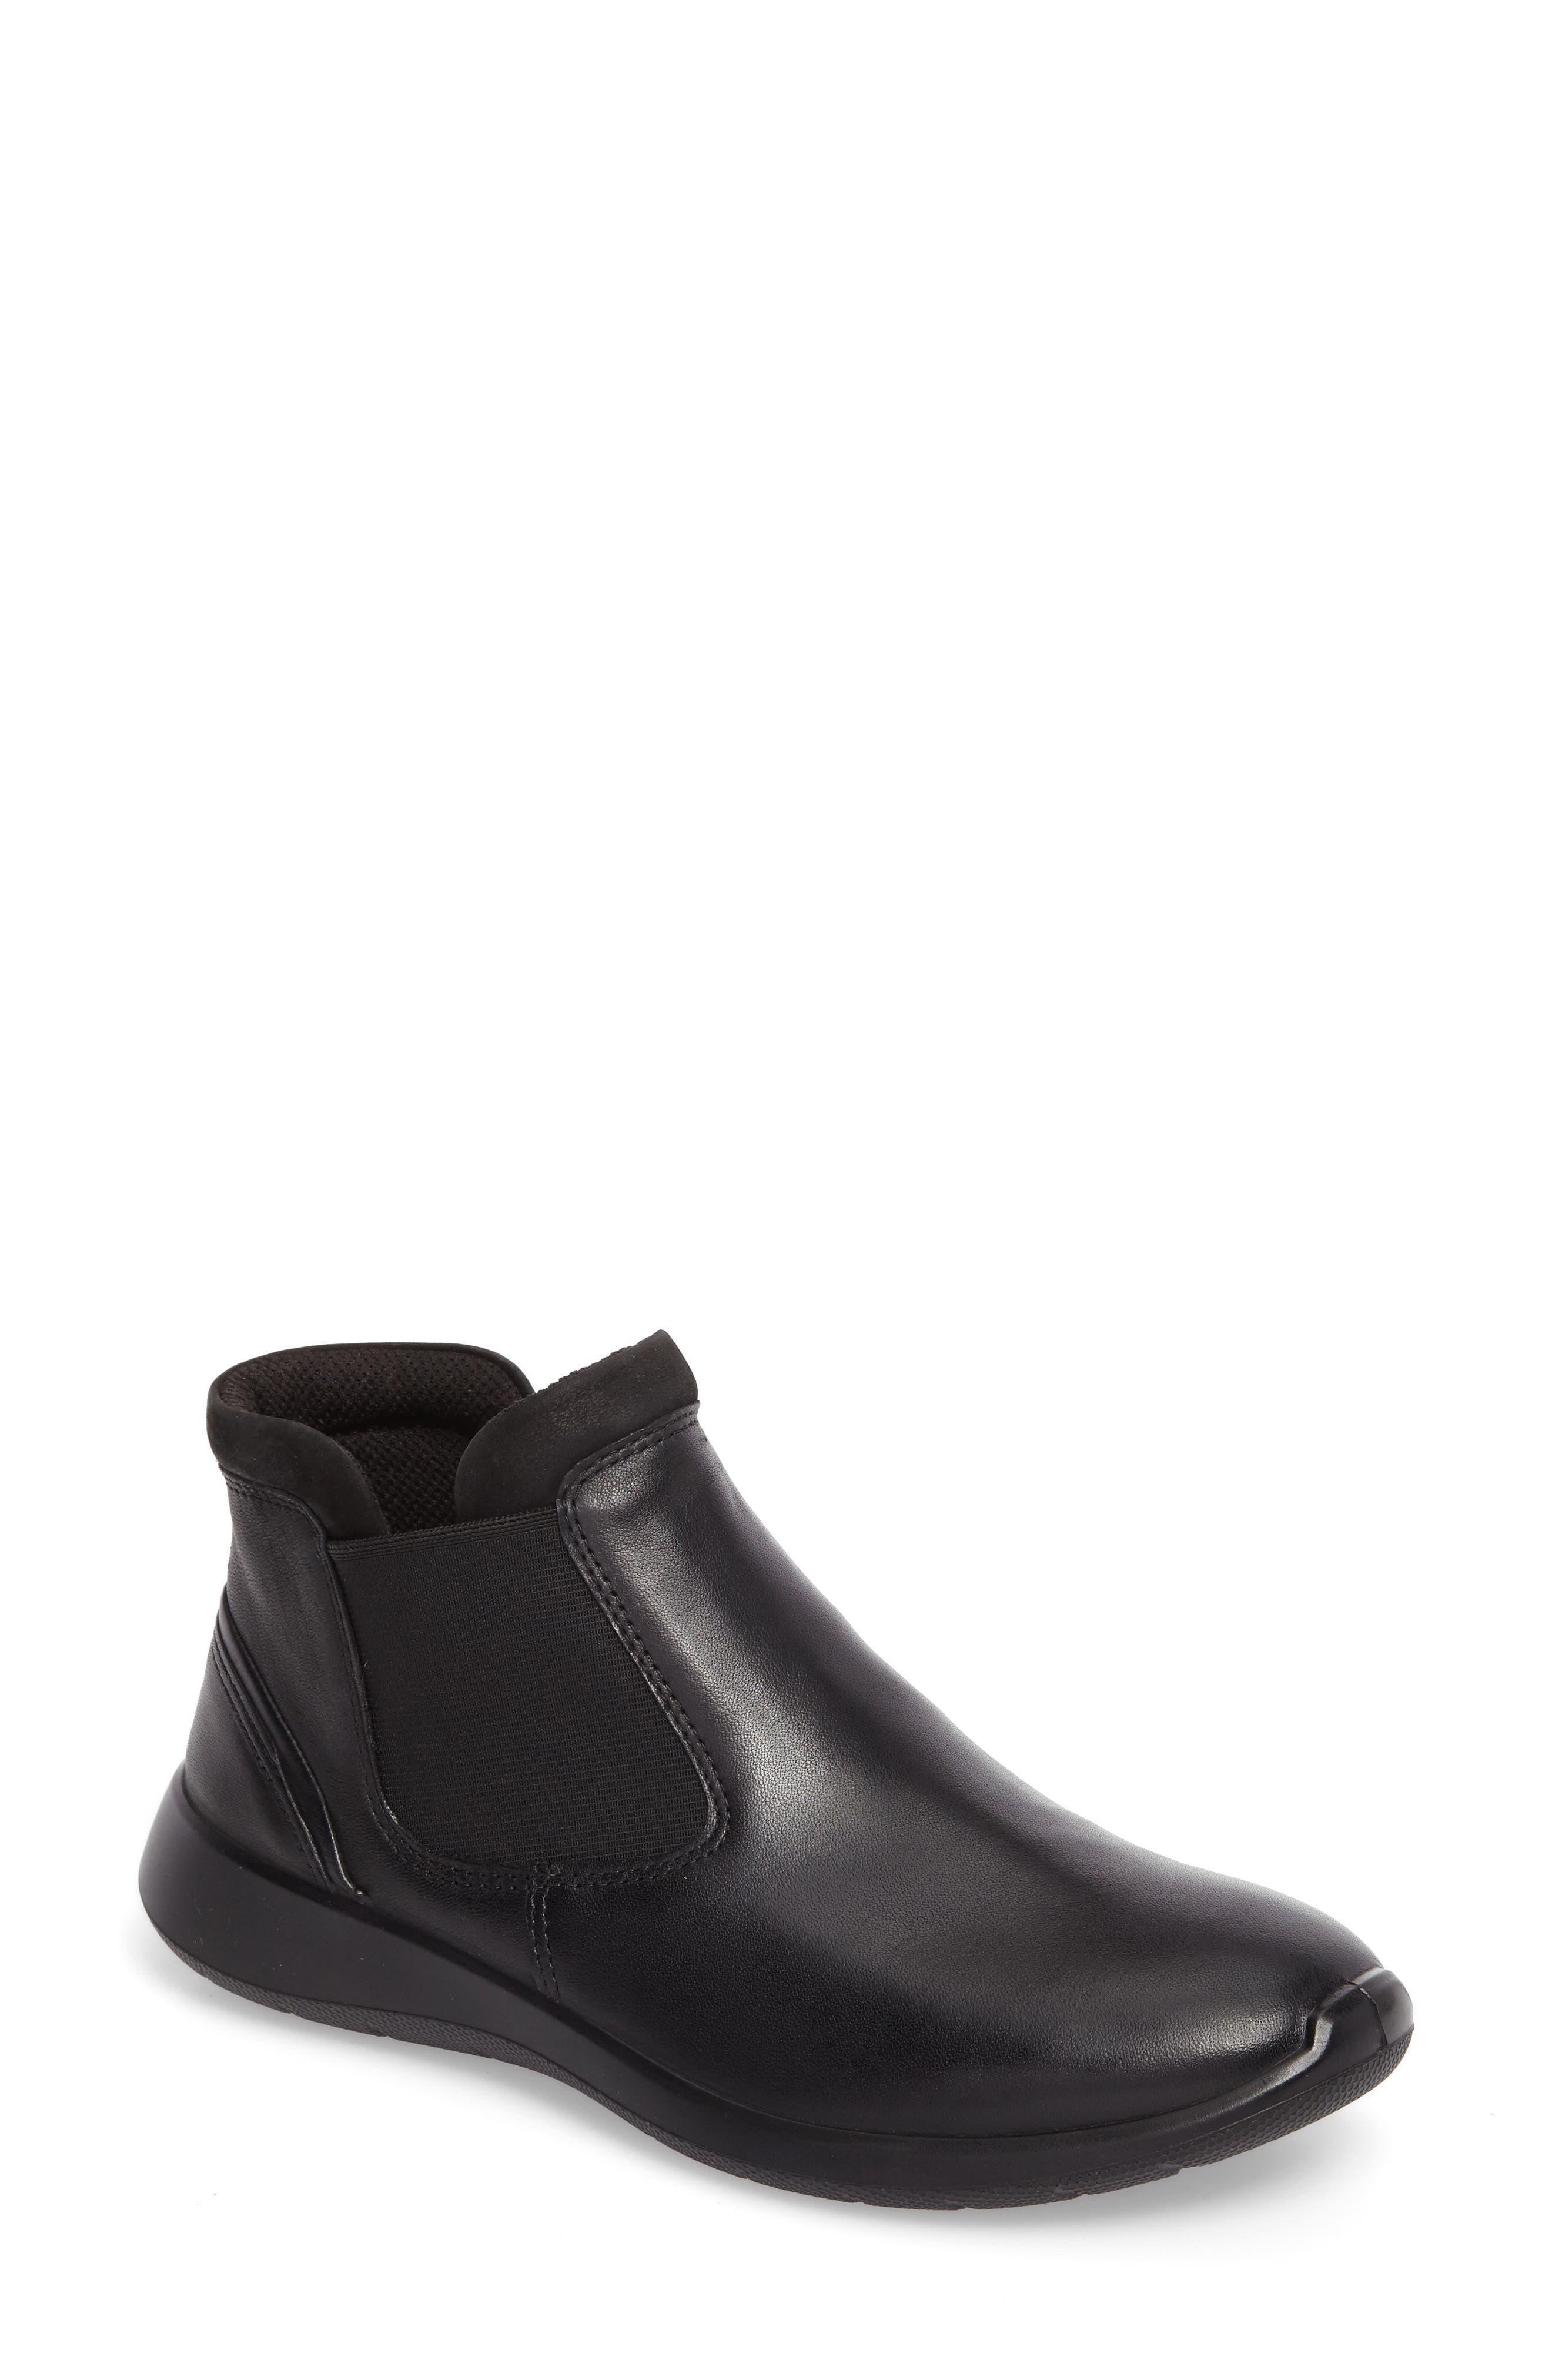 Main Image - ECCO Soft 5 Chelsea Boot (Women)